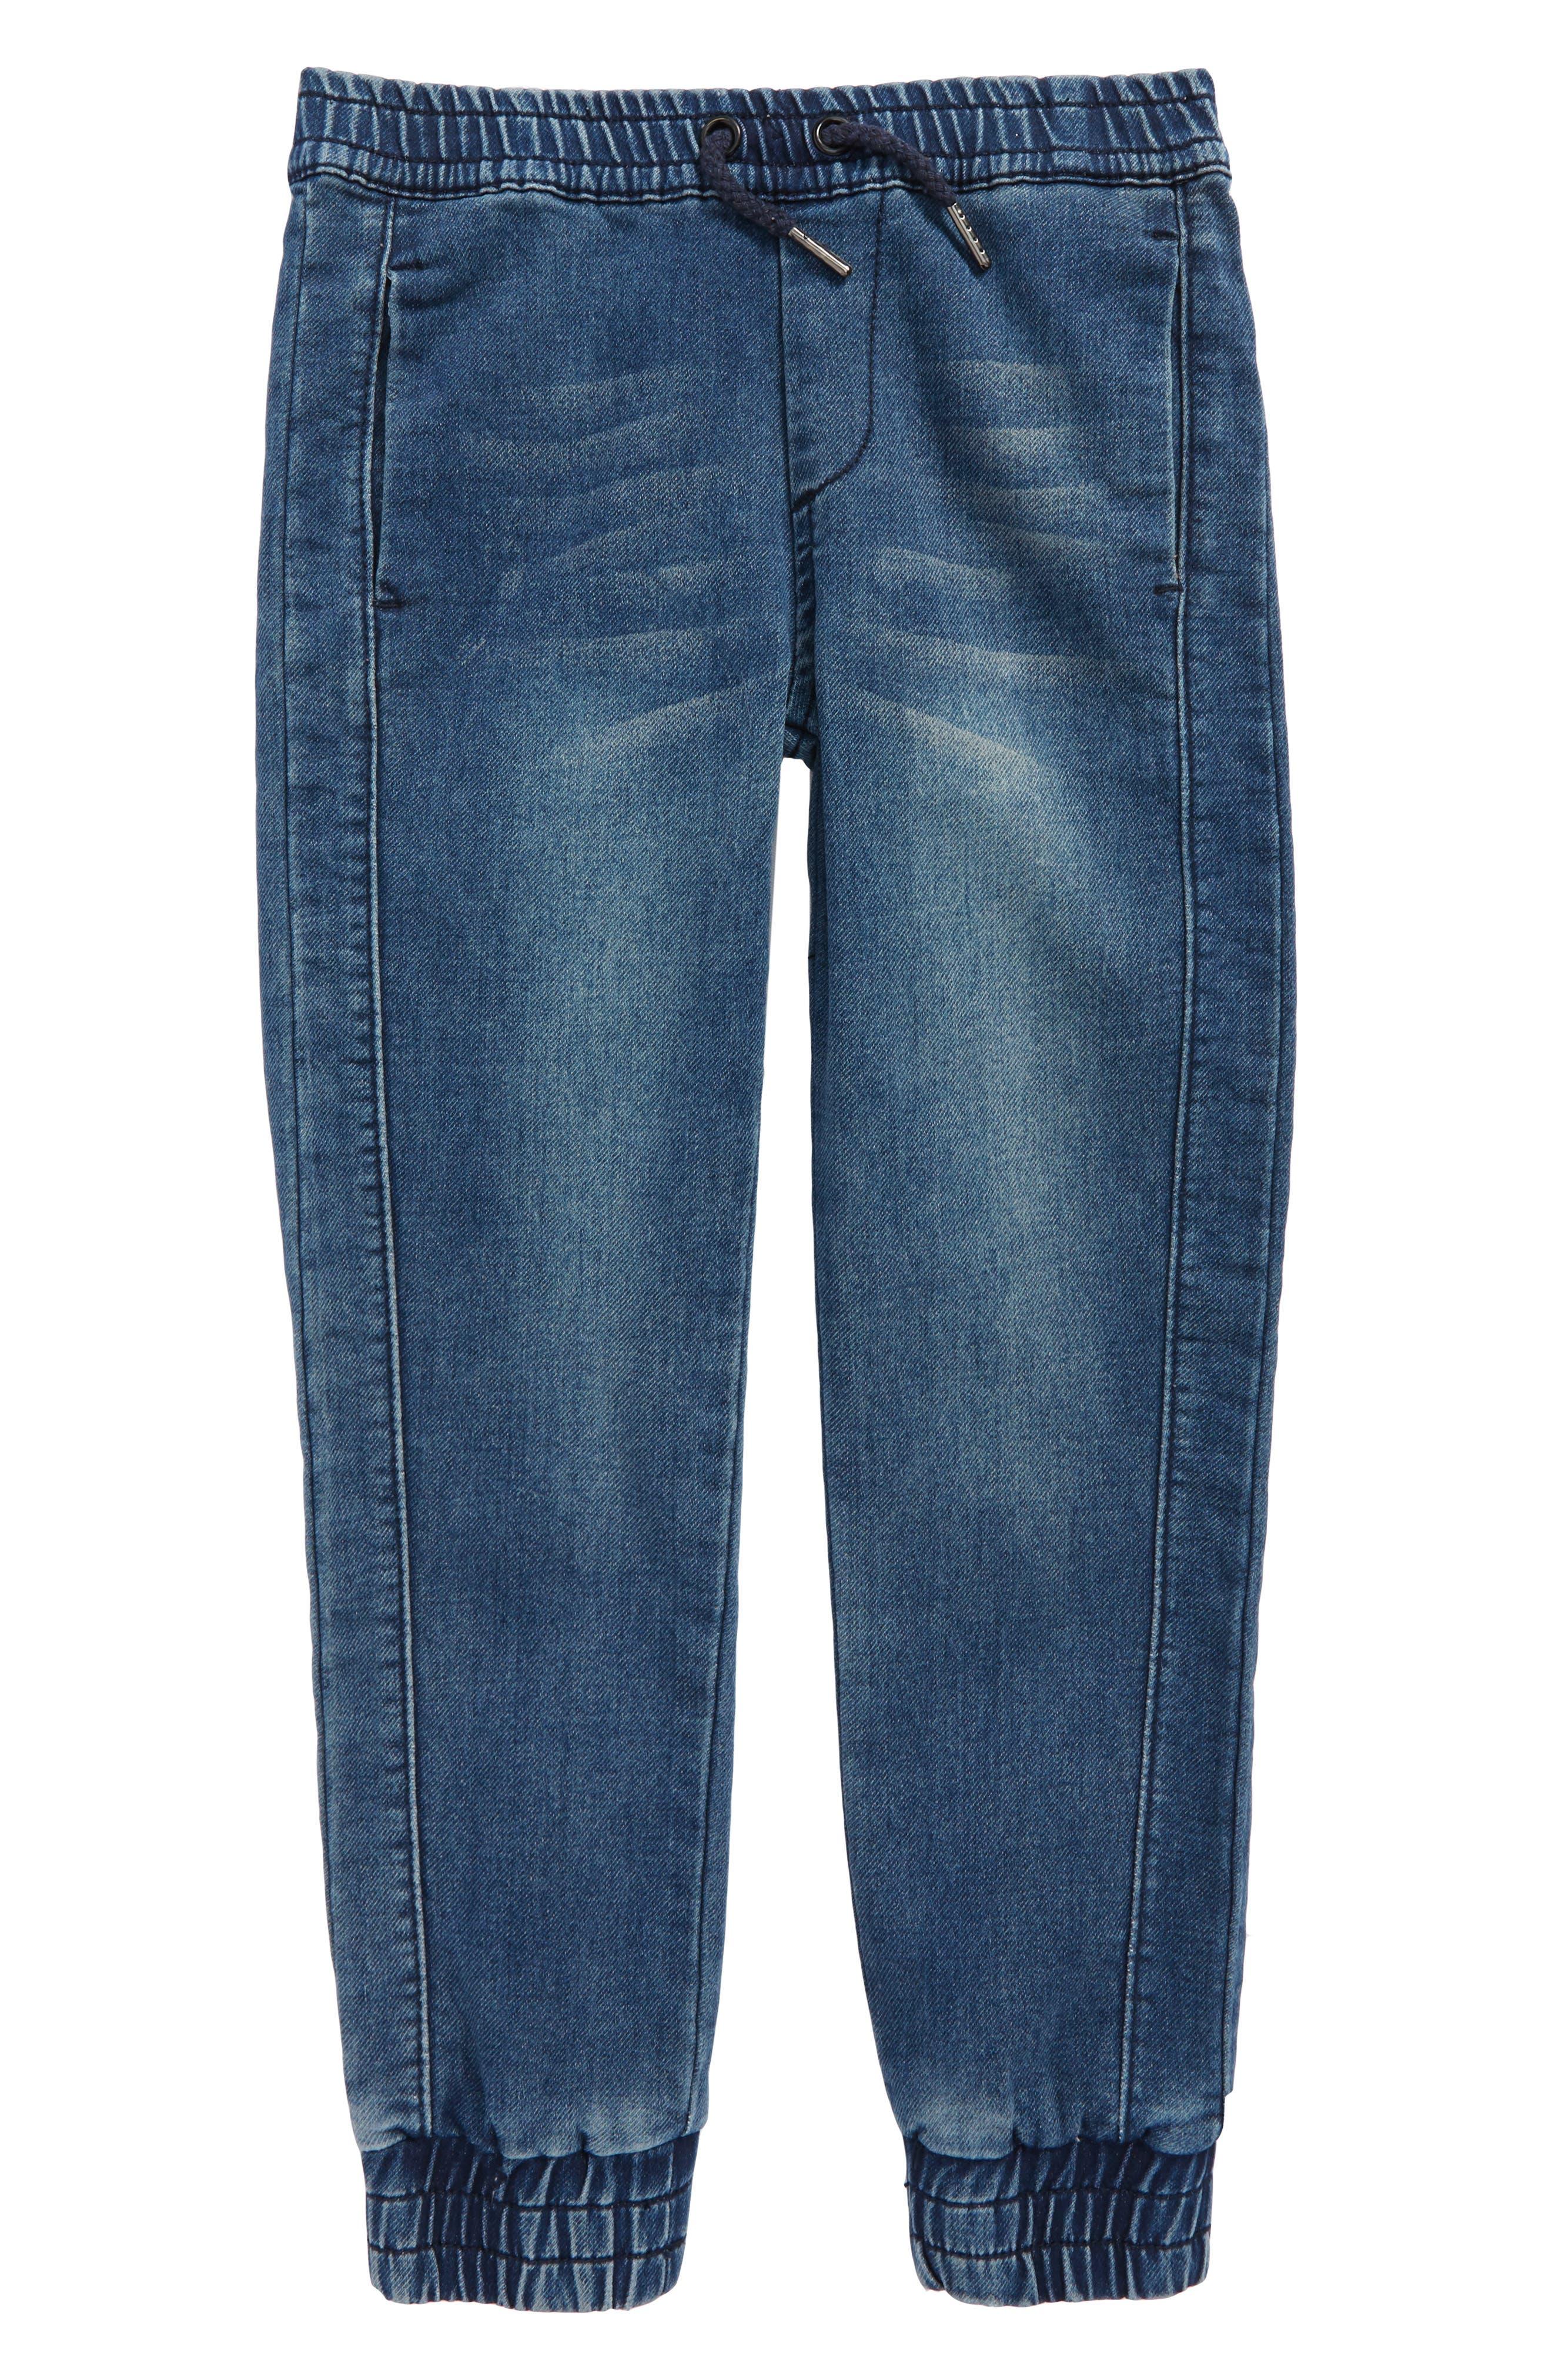 Slim Fit Denim Jogger Pants,                         Main,                         color, Indigo